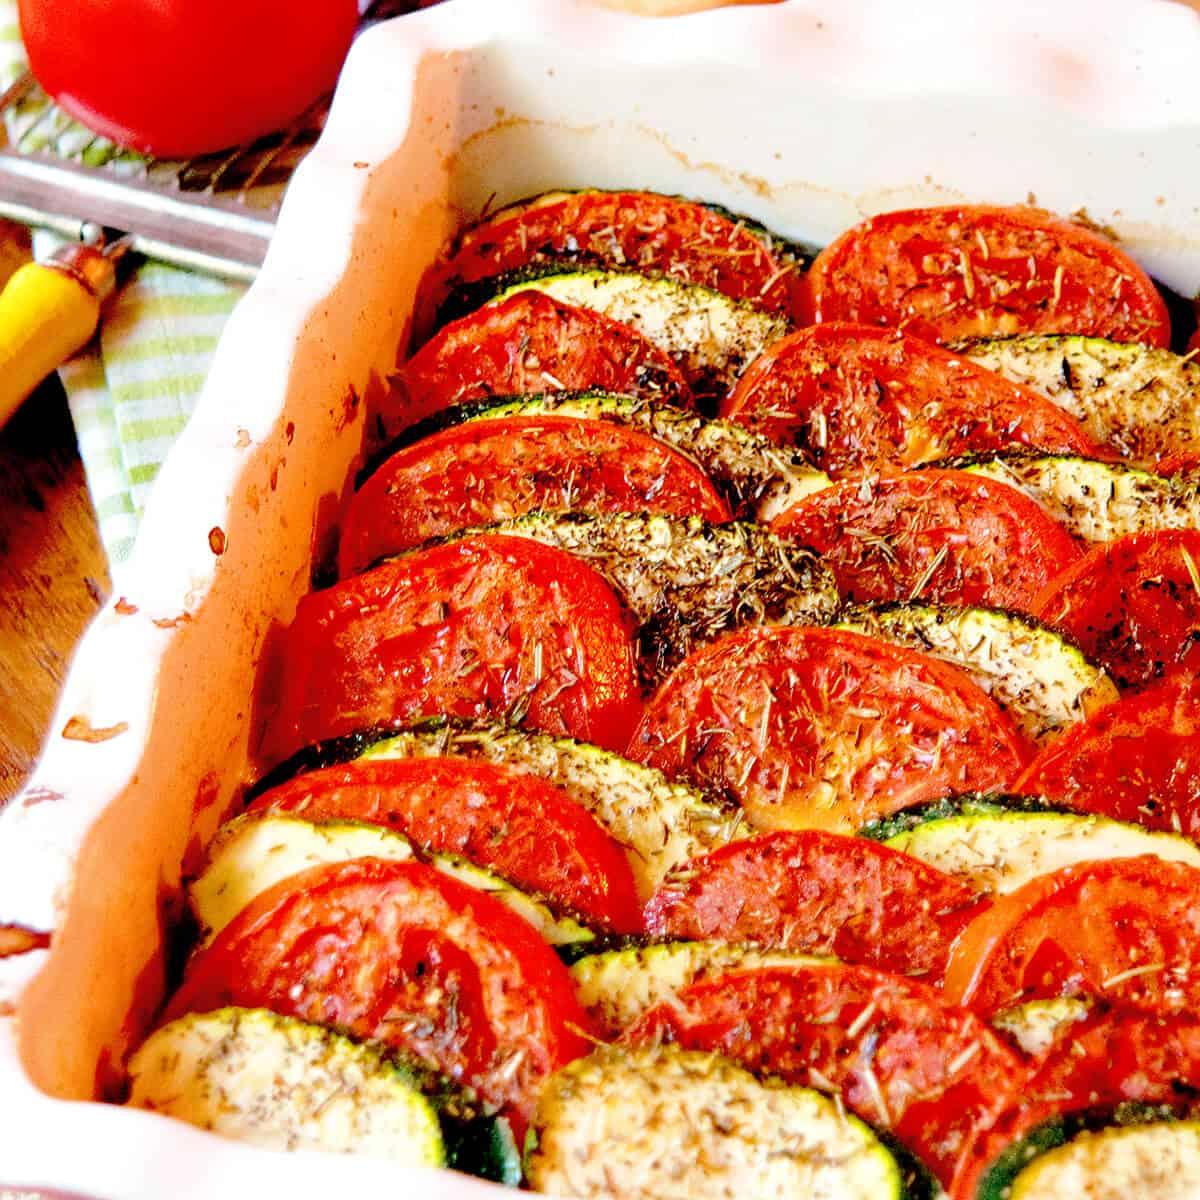 Finished tomato zucchini tian in a baking dish.